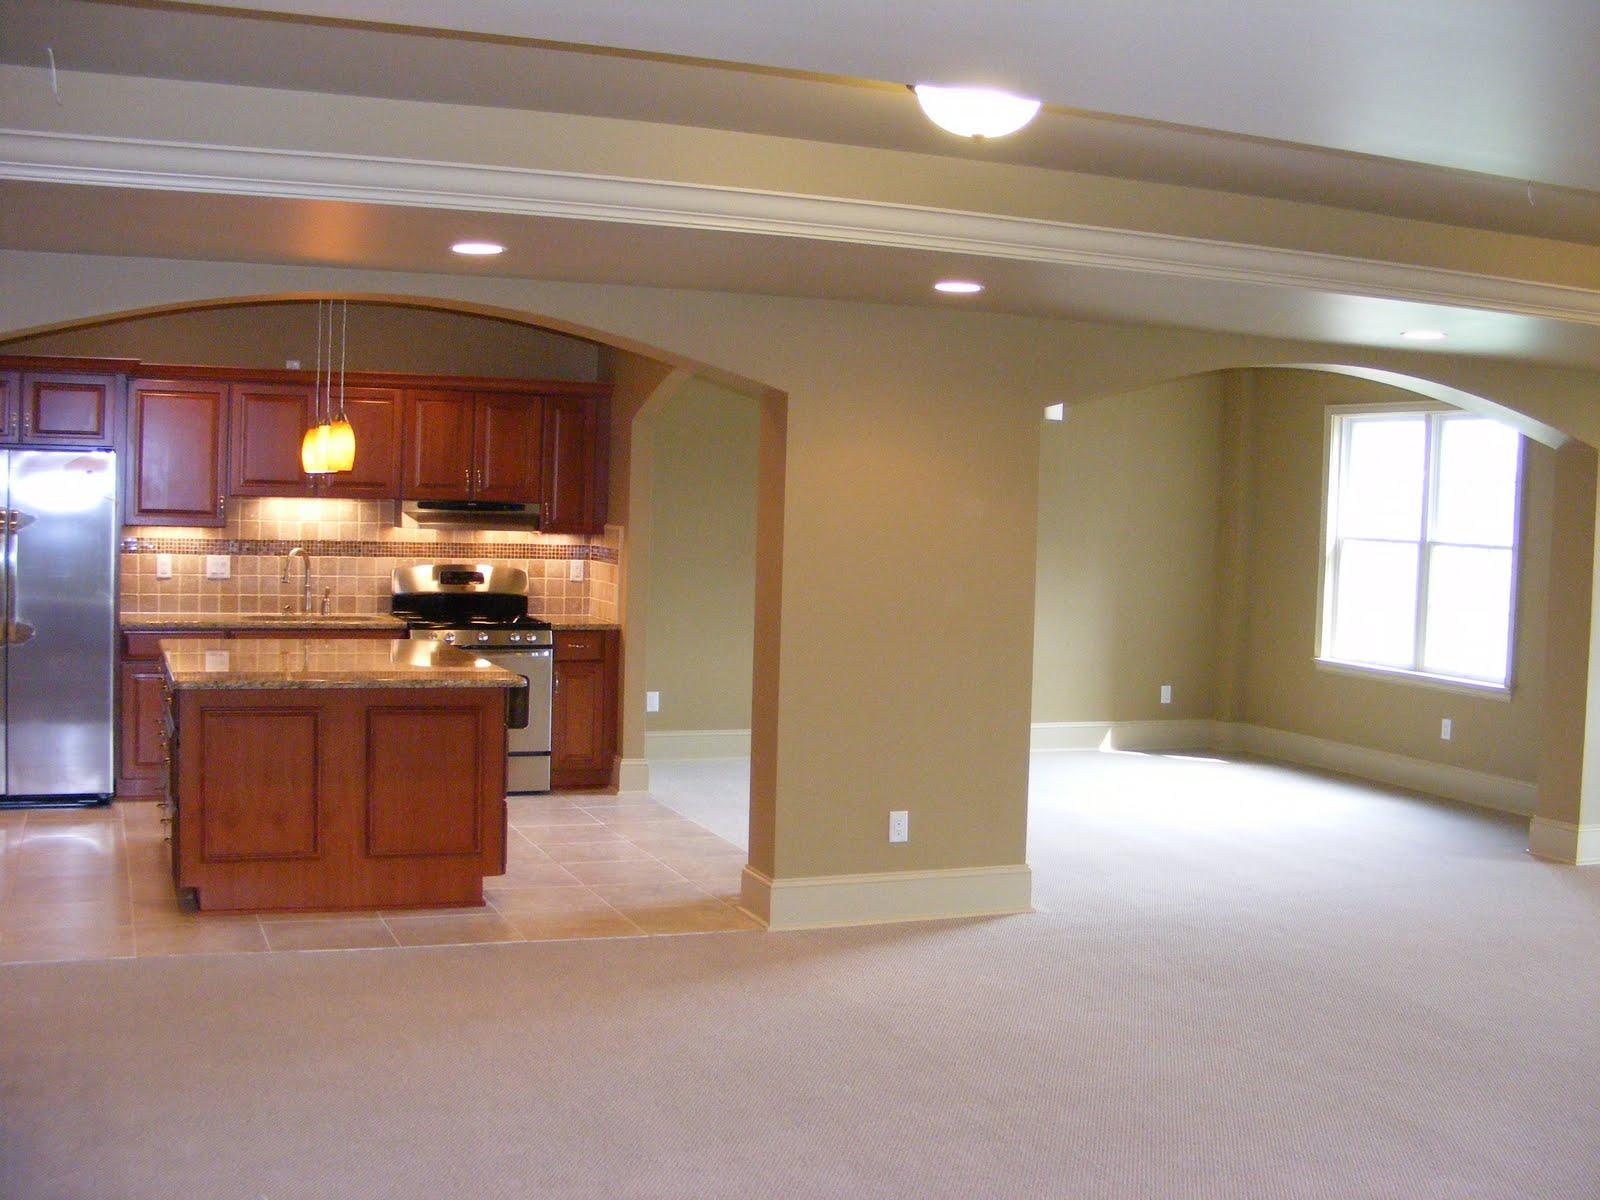 Lighting Basement Washroom Stairs: MHI Interiors: Novi Basement Remodel